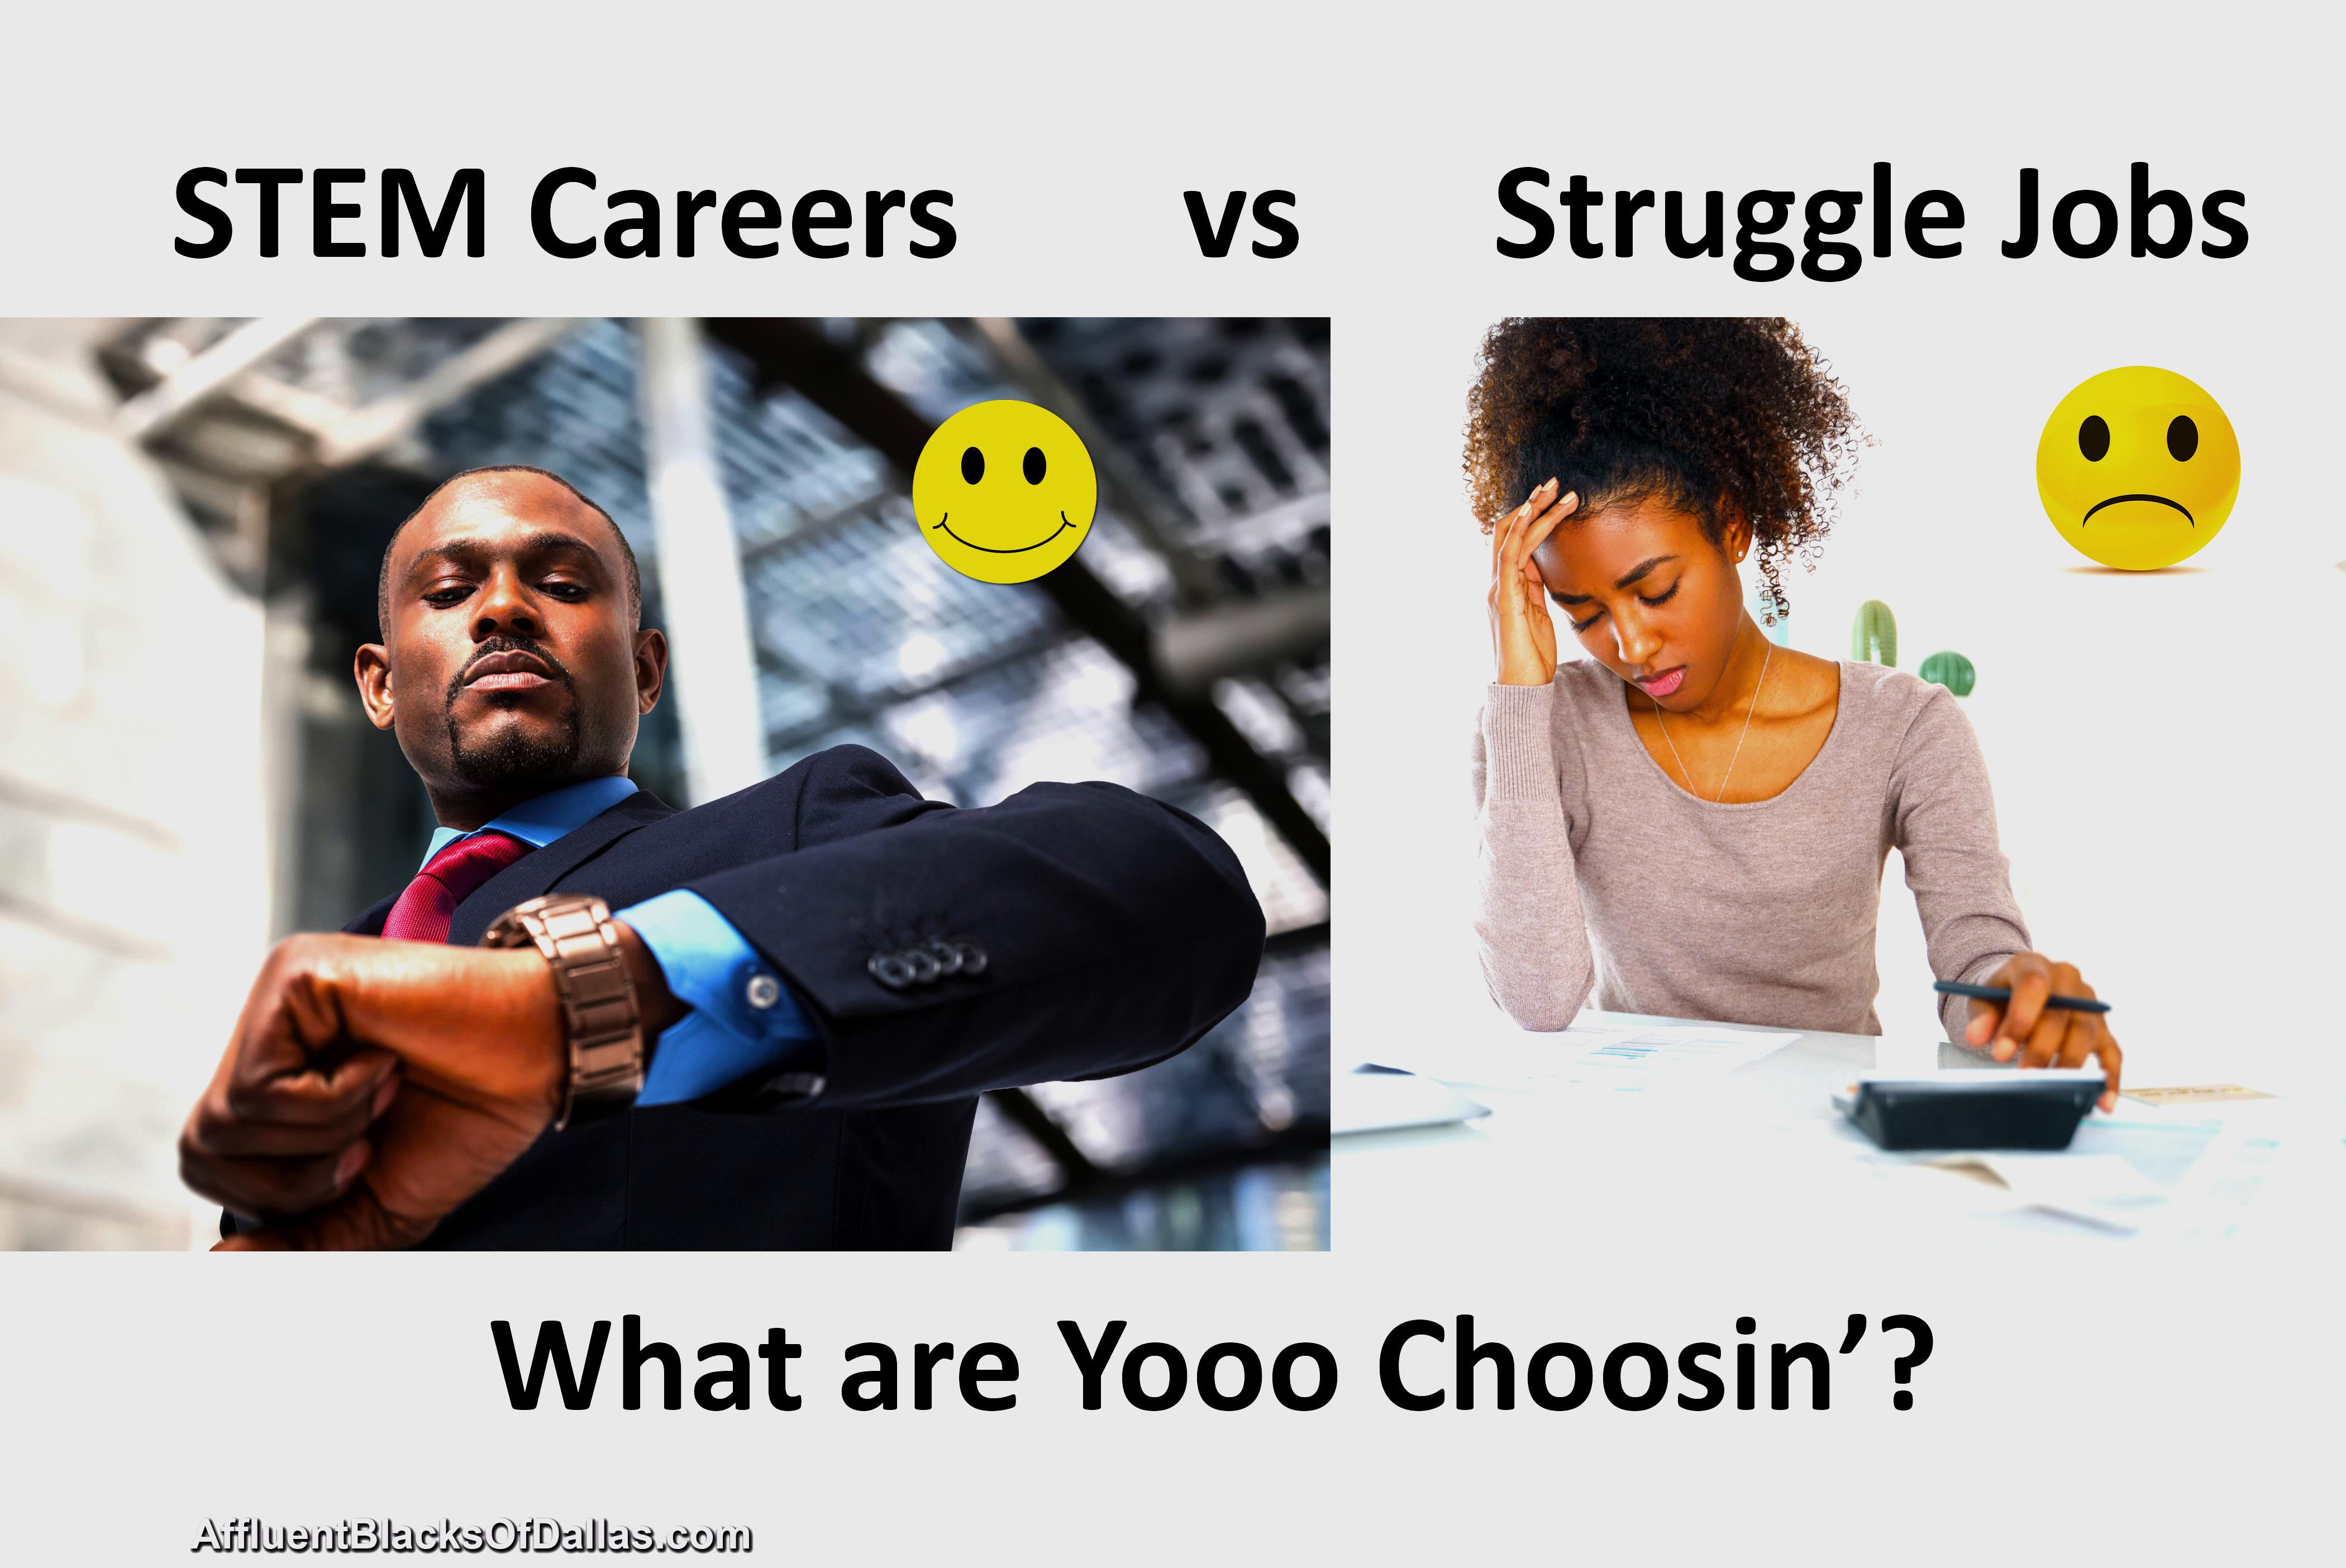 STEM Careers vs Struggle Jobs – What Yooo Choosin'? Is it Fashion Design?